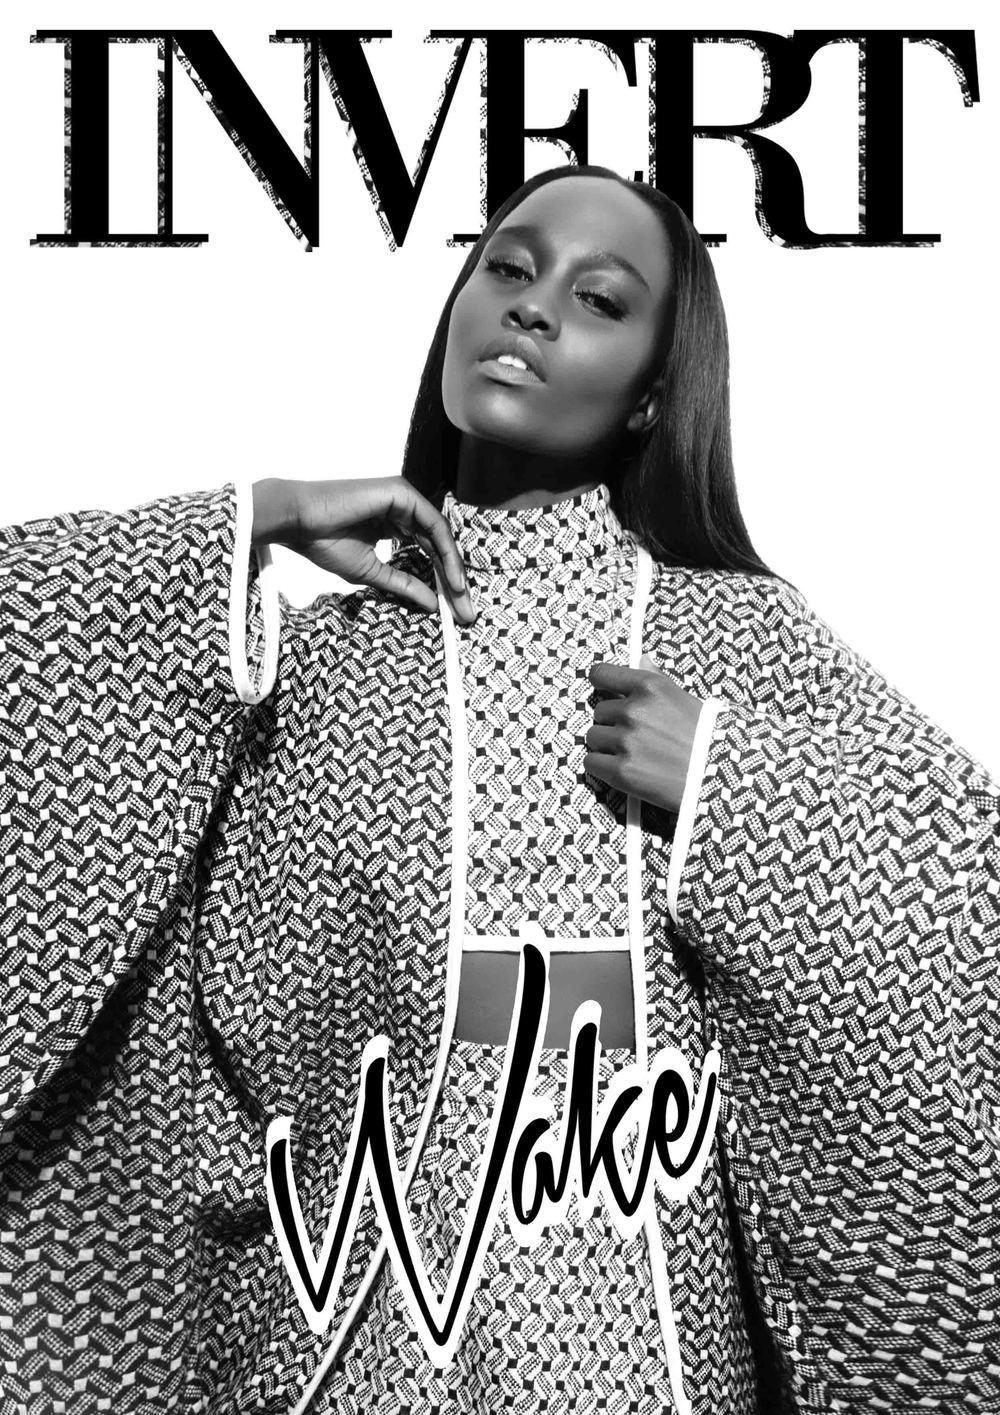 WAKE ISSUE COVER.jpg